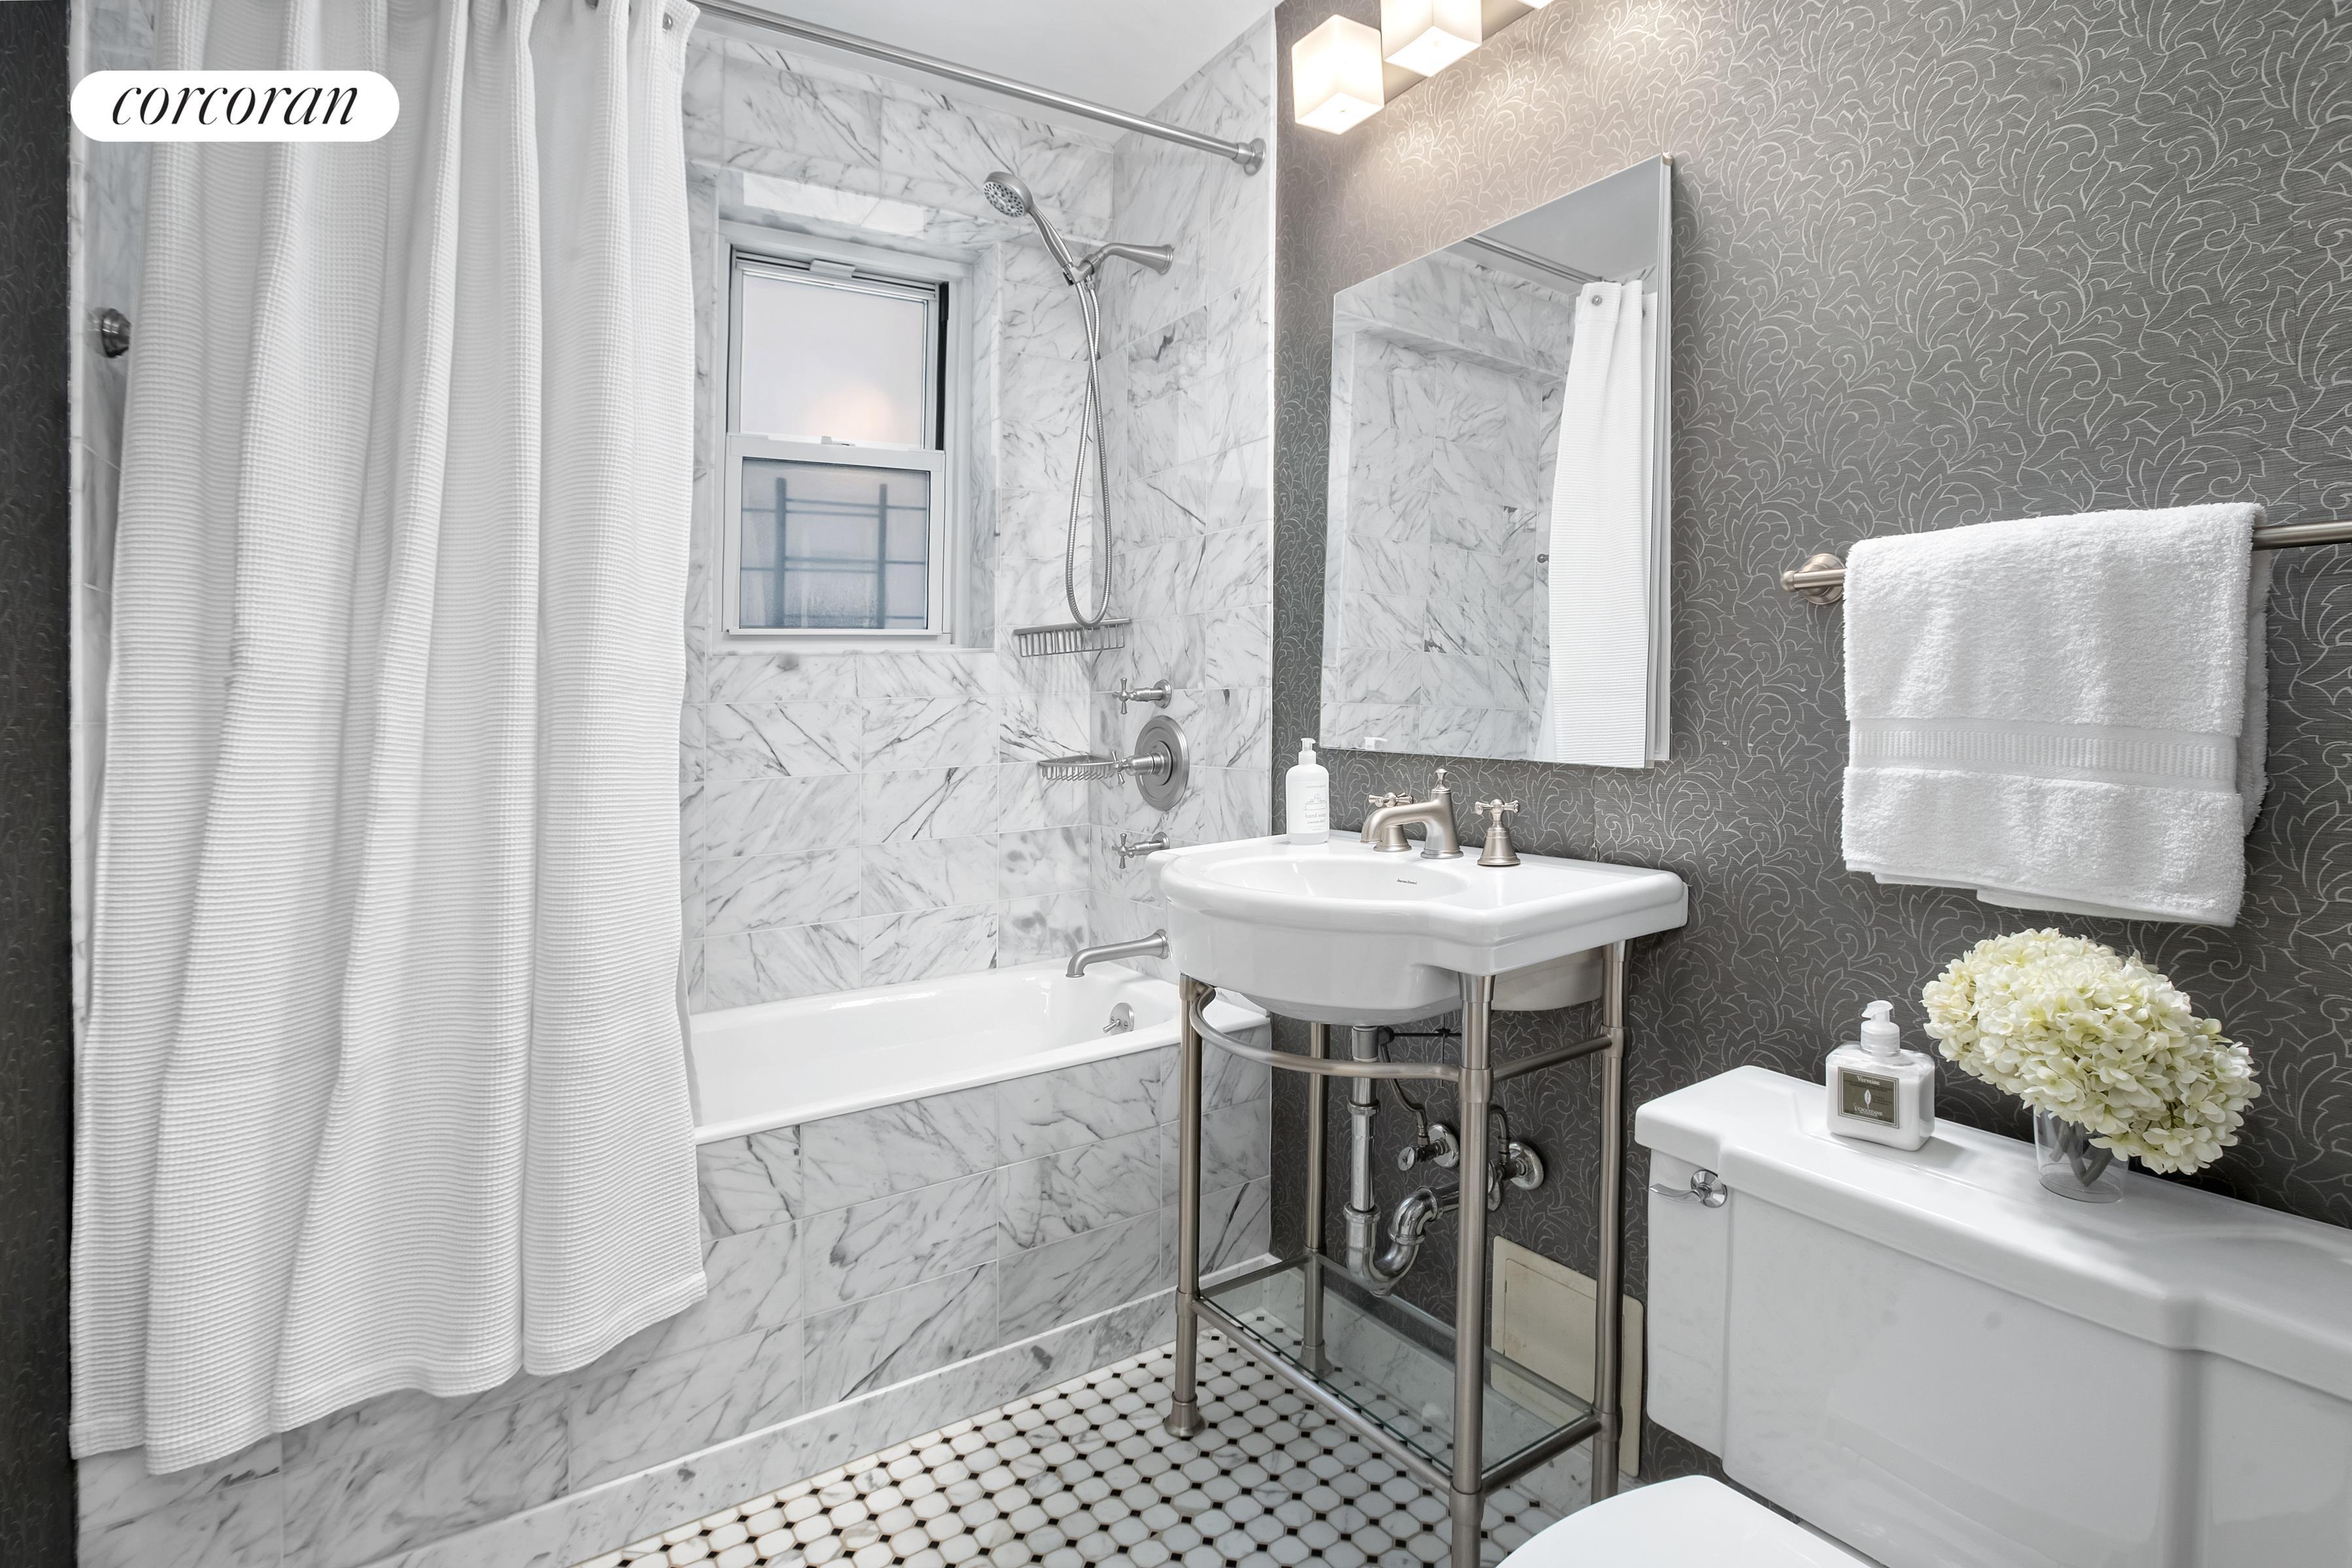 196 East 75th Street Upper East Side New York NY 10021